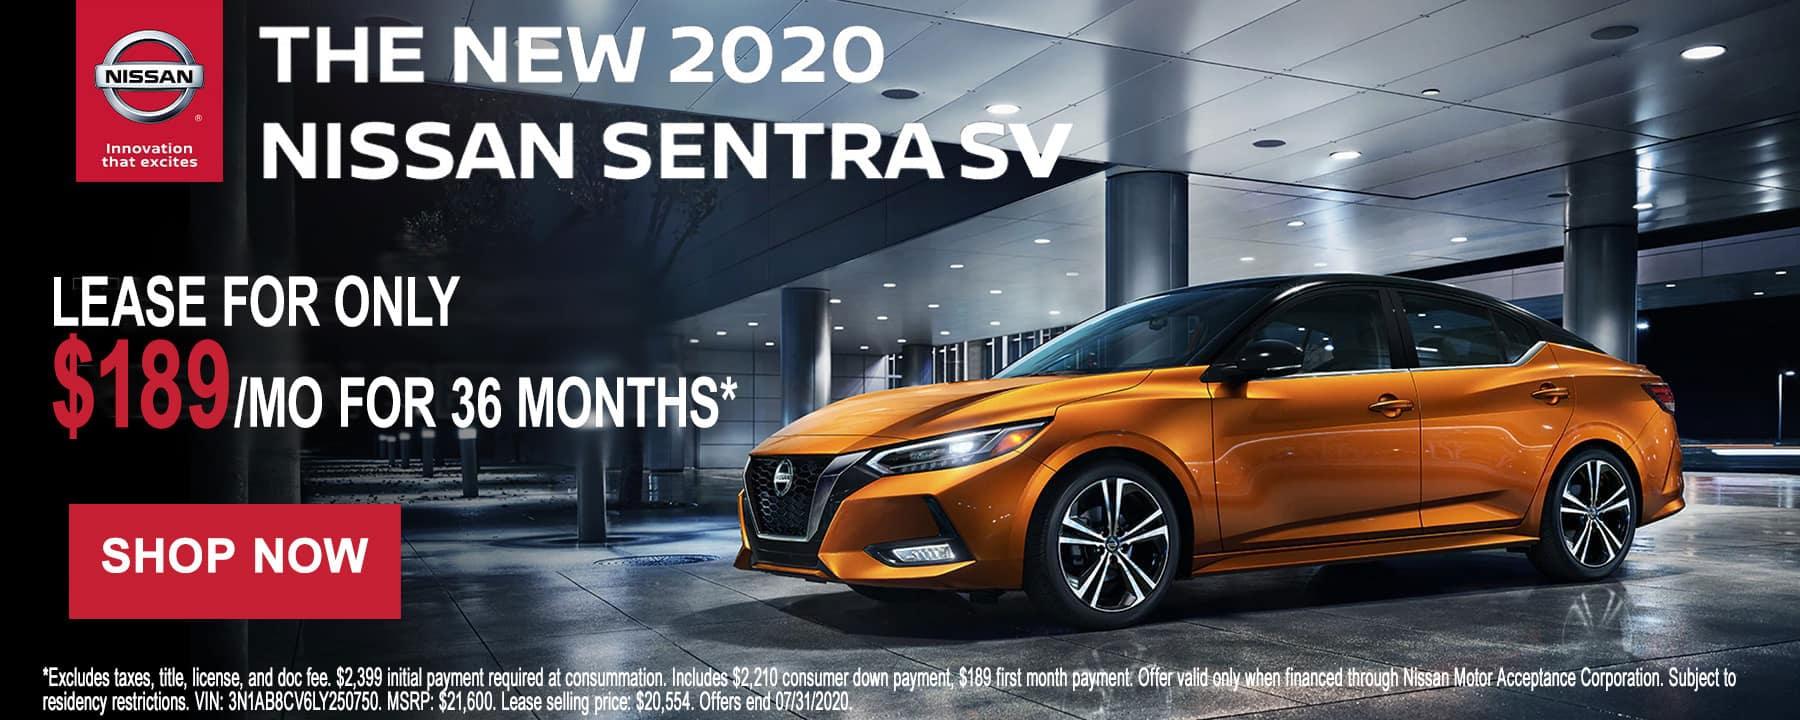 2020 Nissan Sentra July Offer at Star Nissan